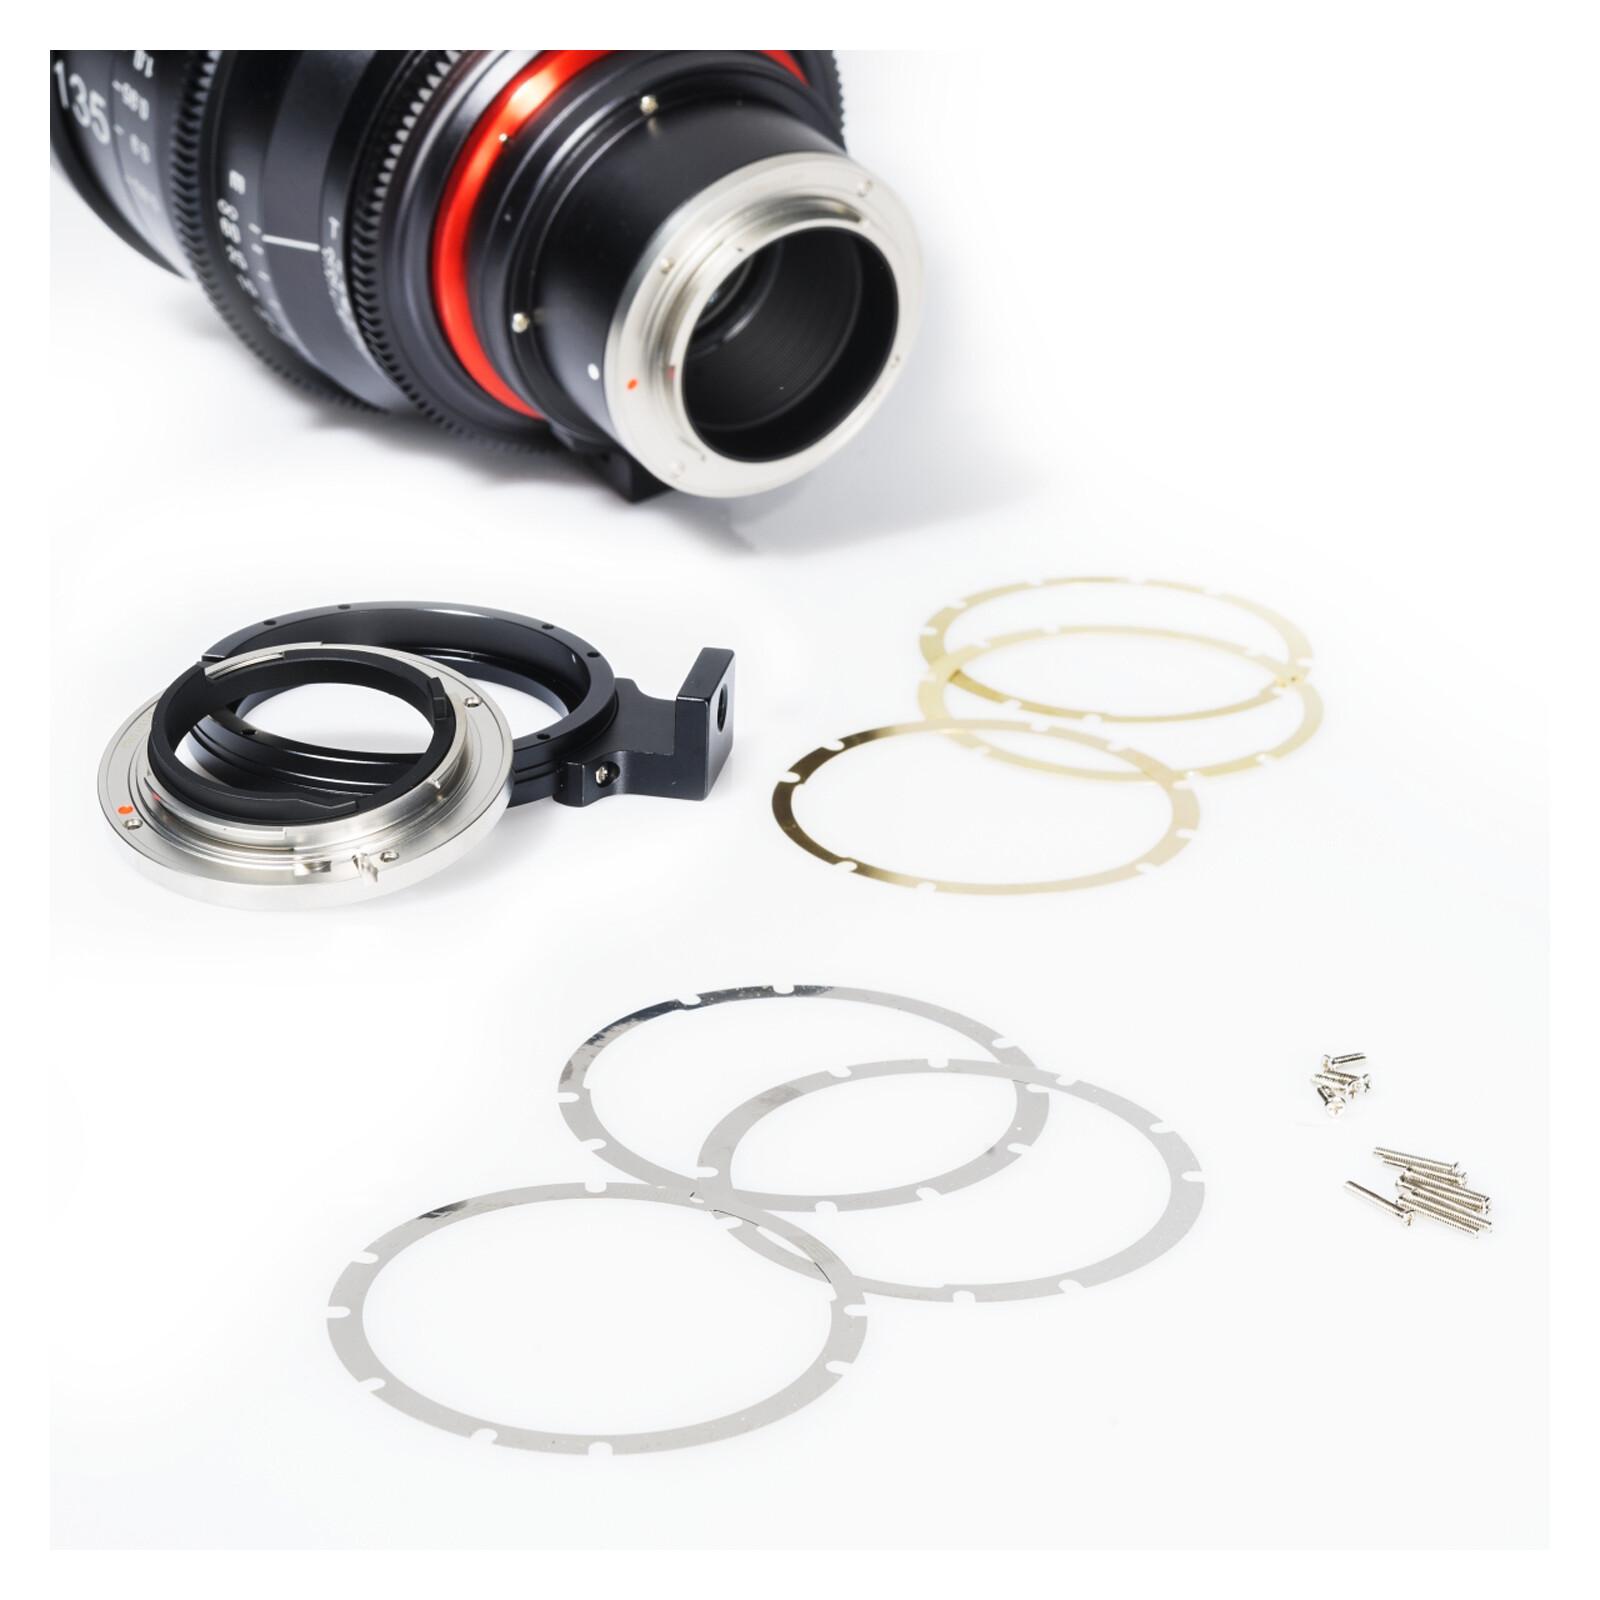 XEEN Mount Kit Nikon F 135mm